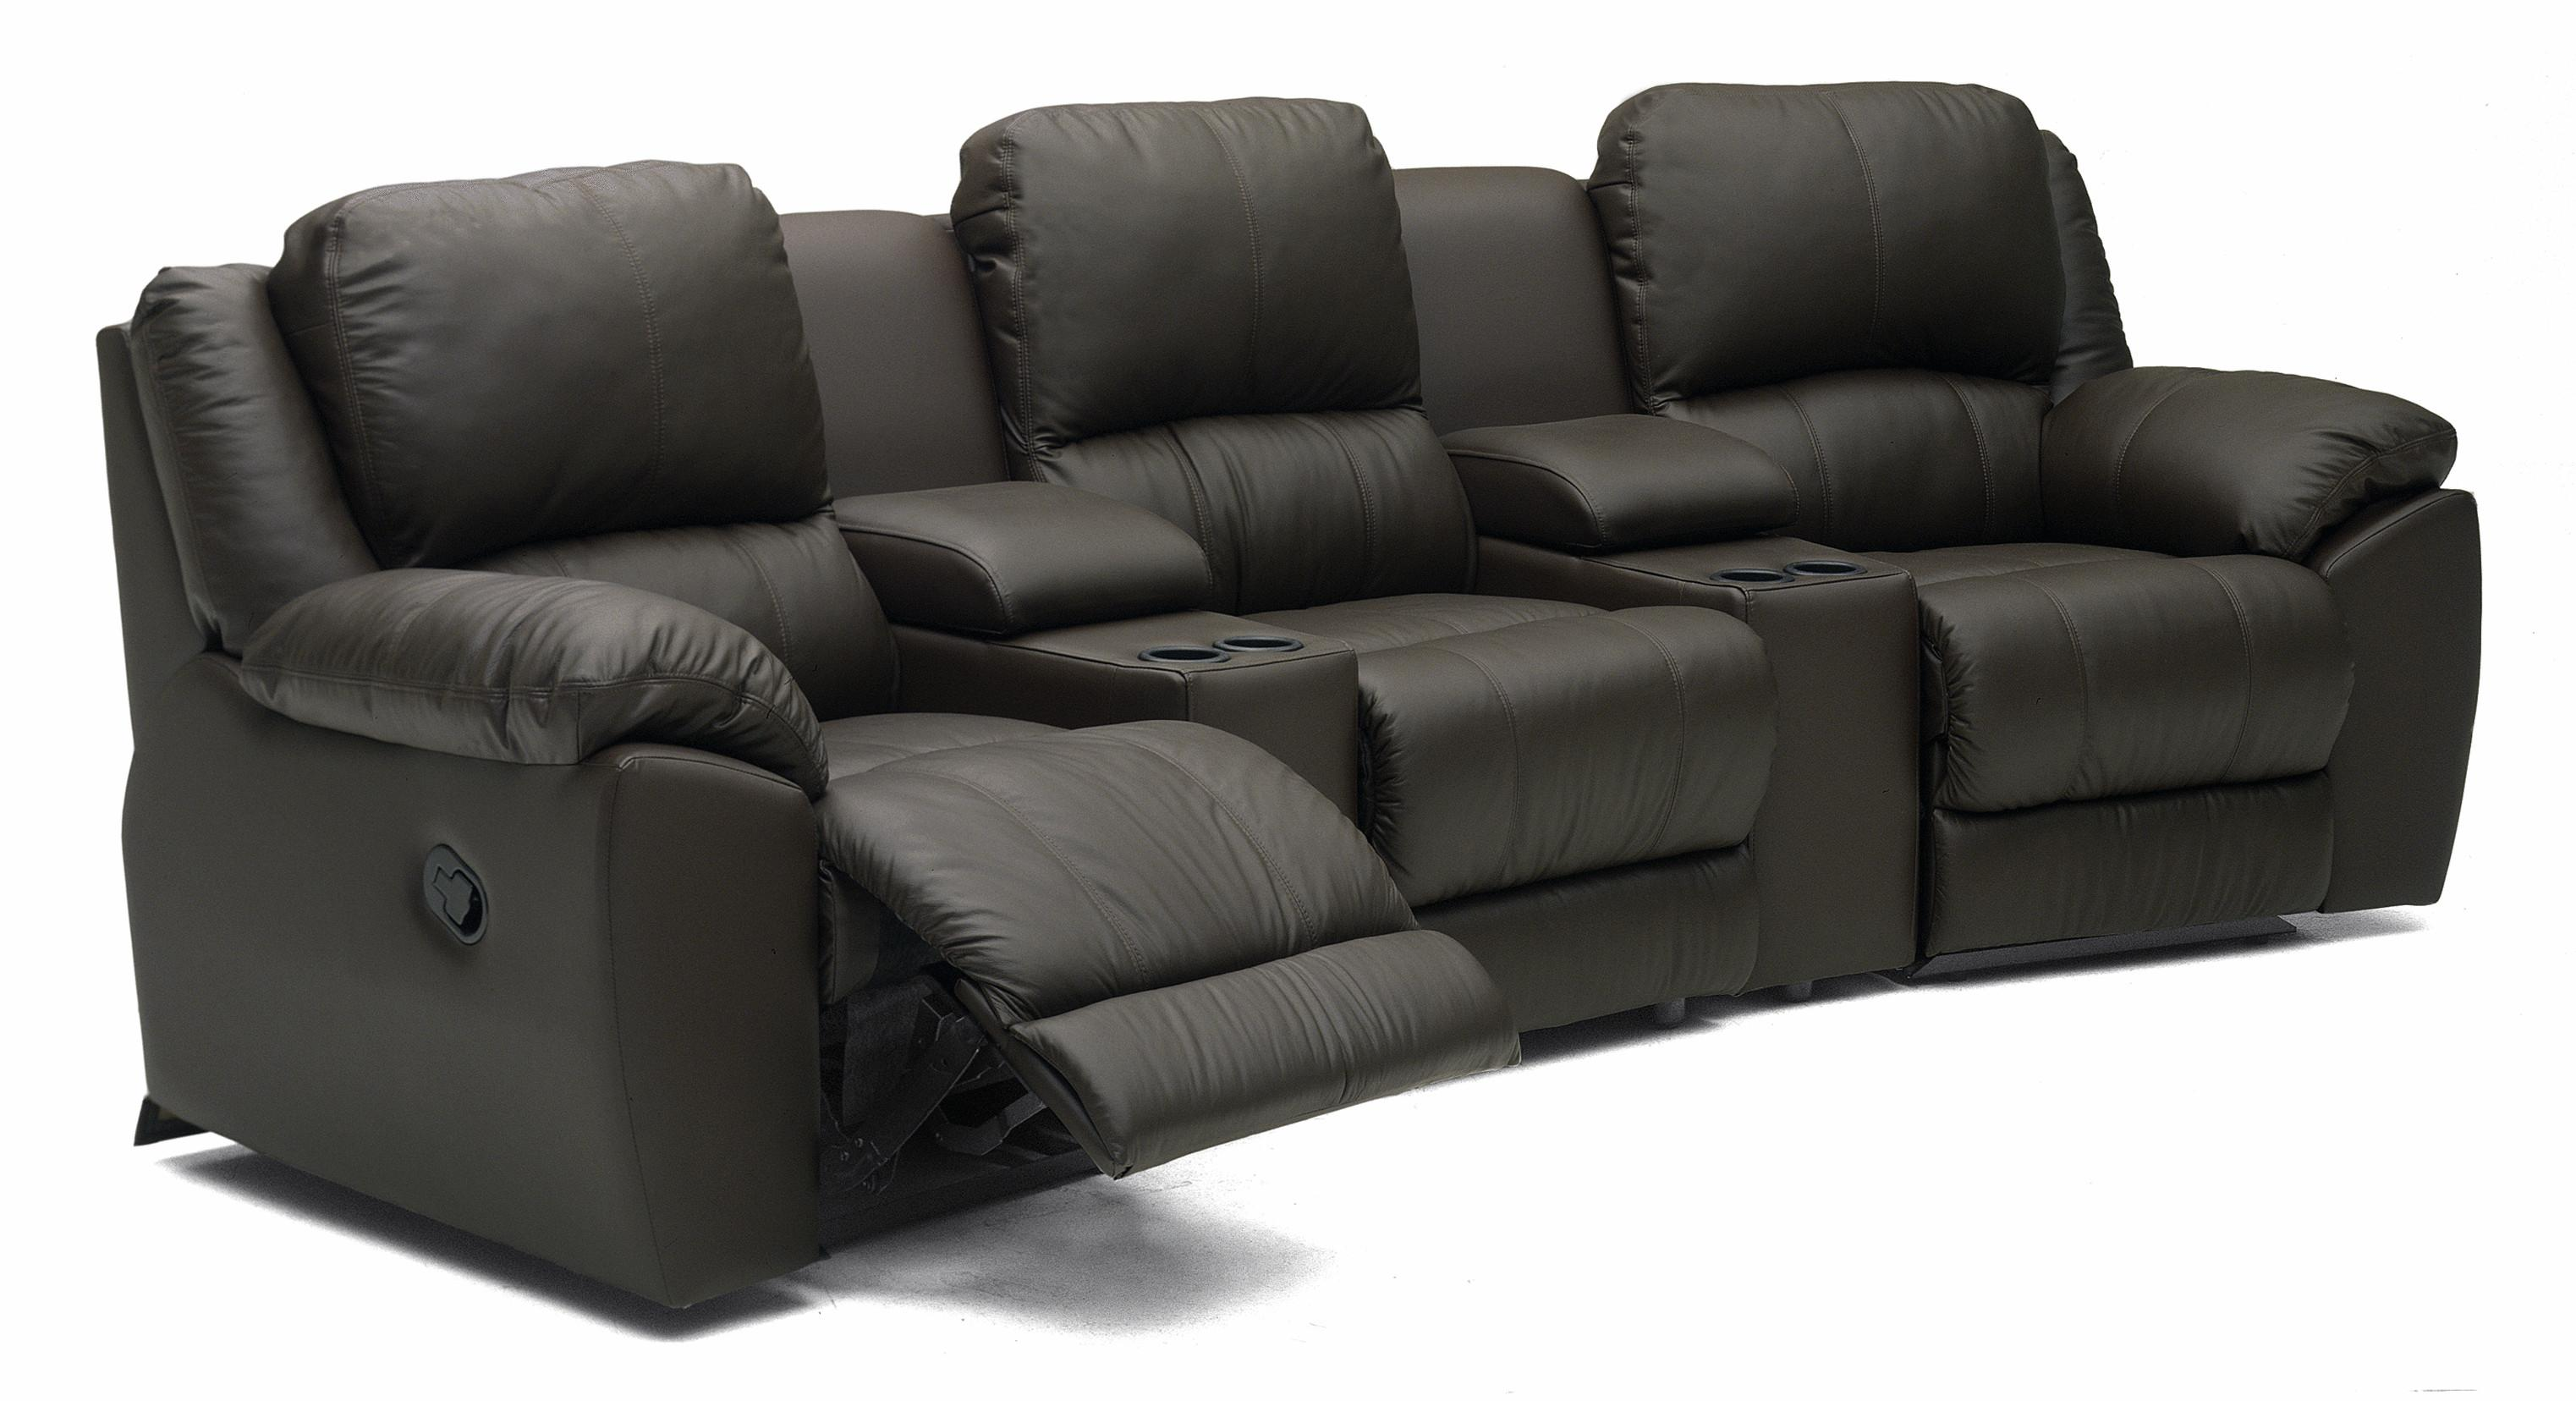 palliser benson 41164 home theater seating ahfa theater